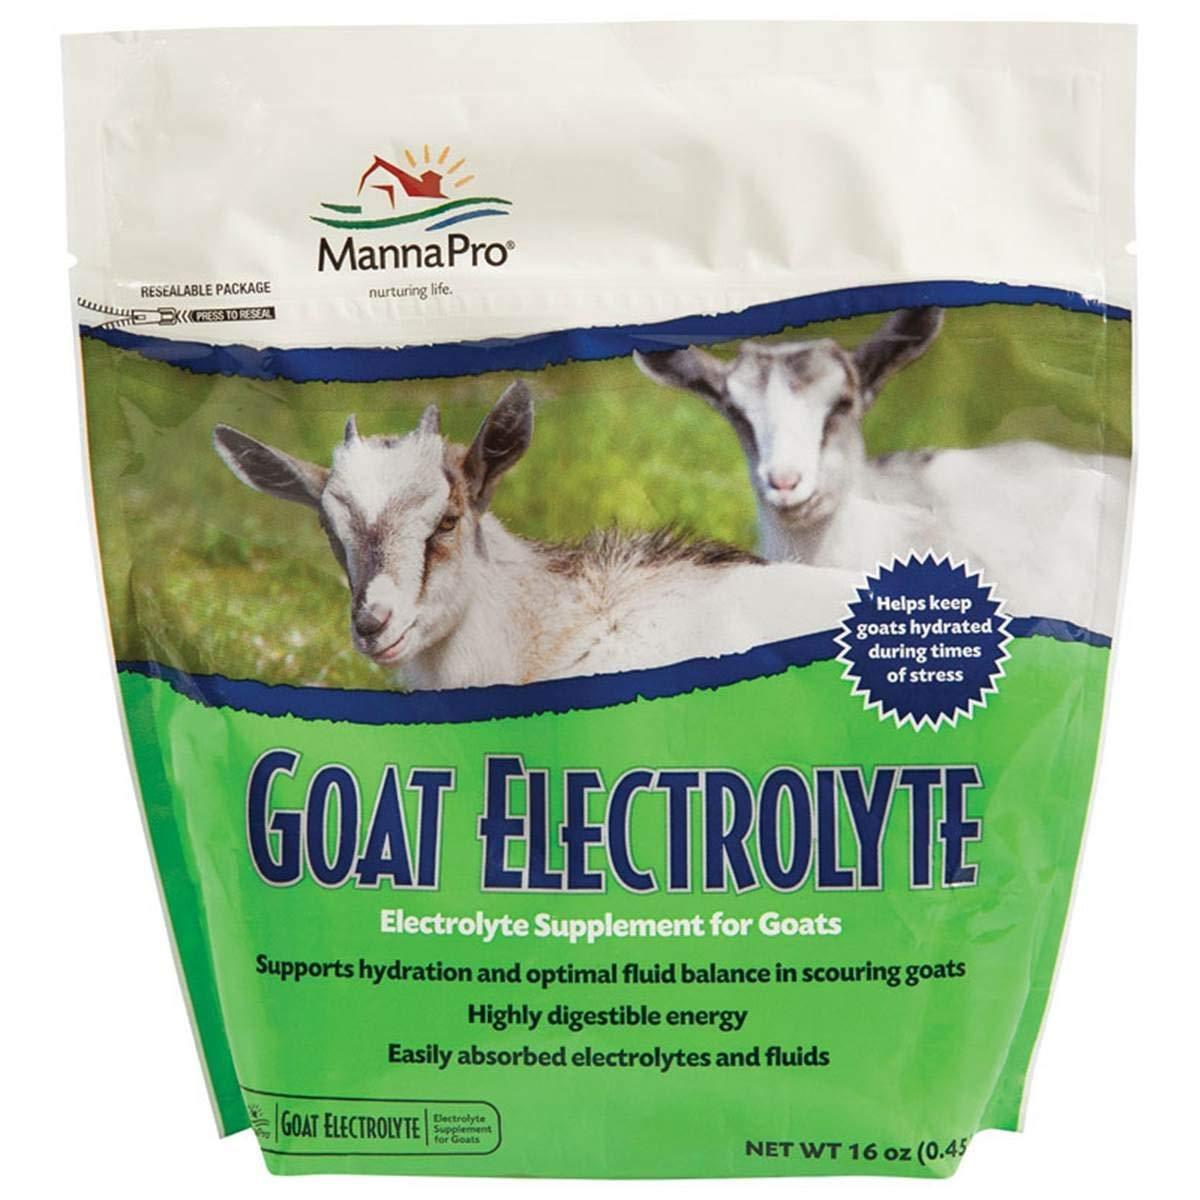 Manna Pro Goat Electrolyte, 1 Pound, Supplement for Proper Hydration